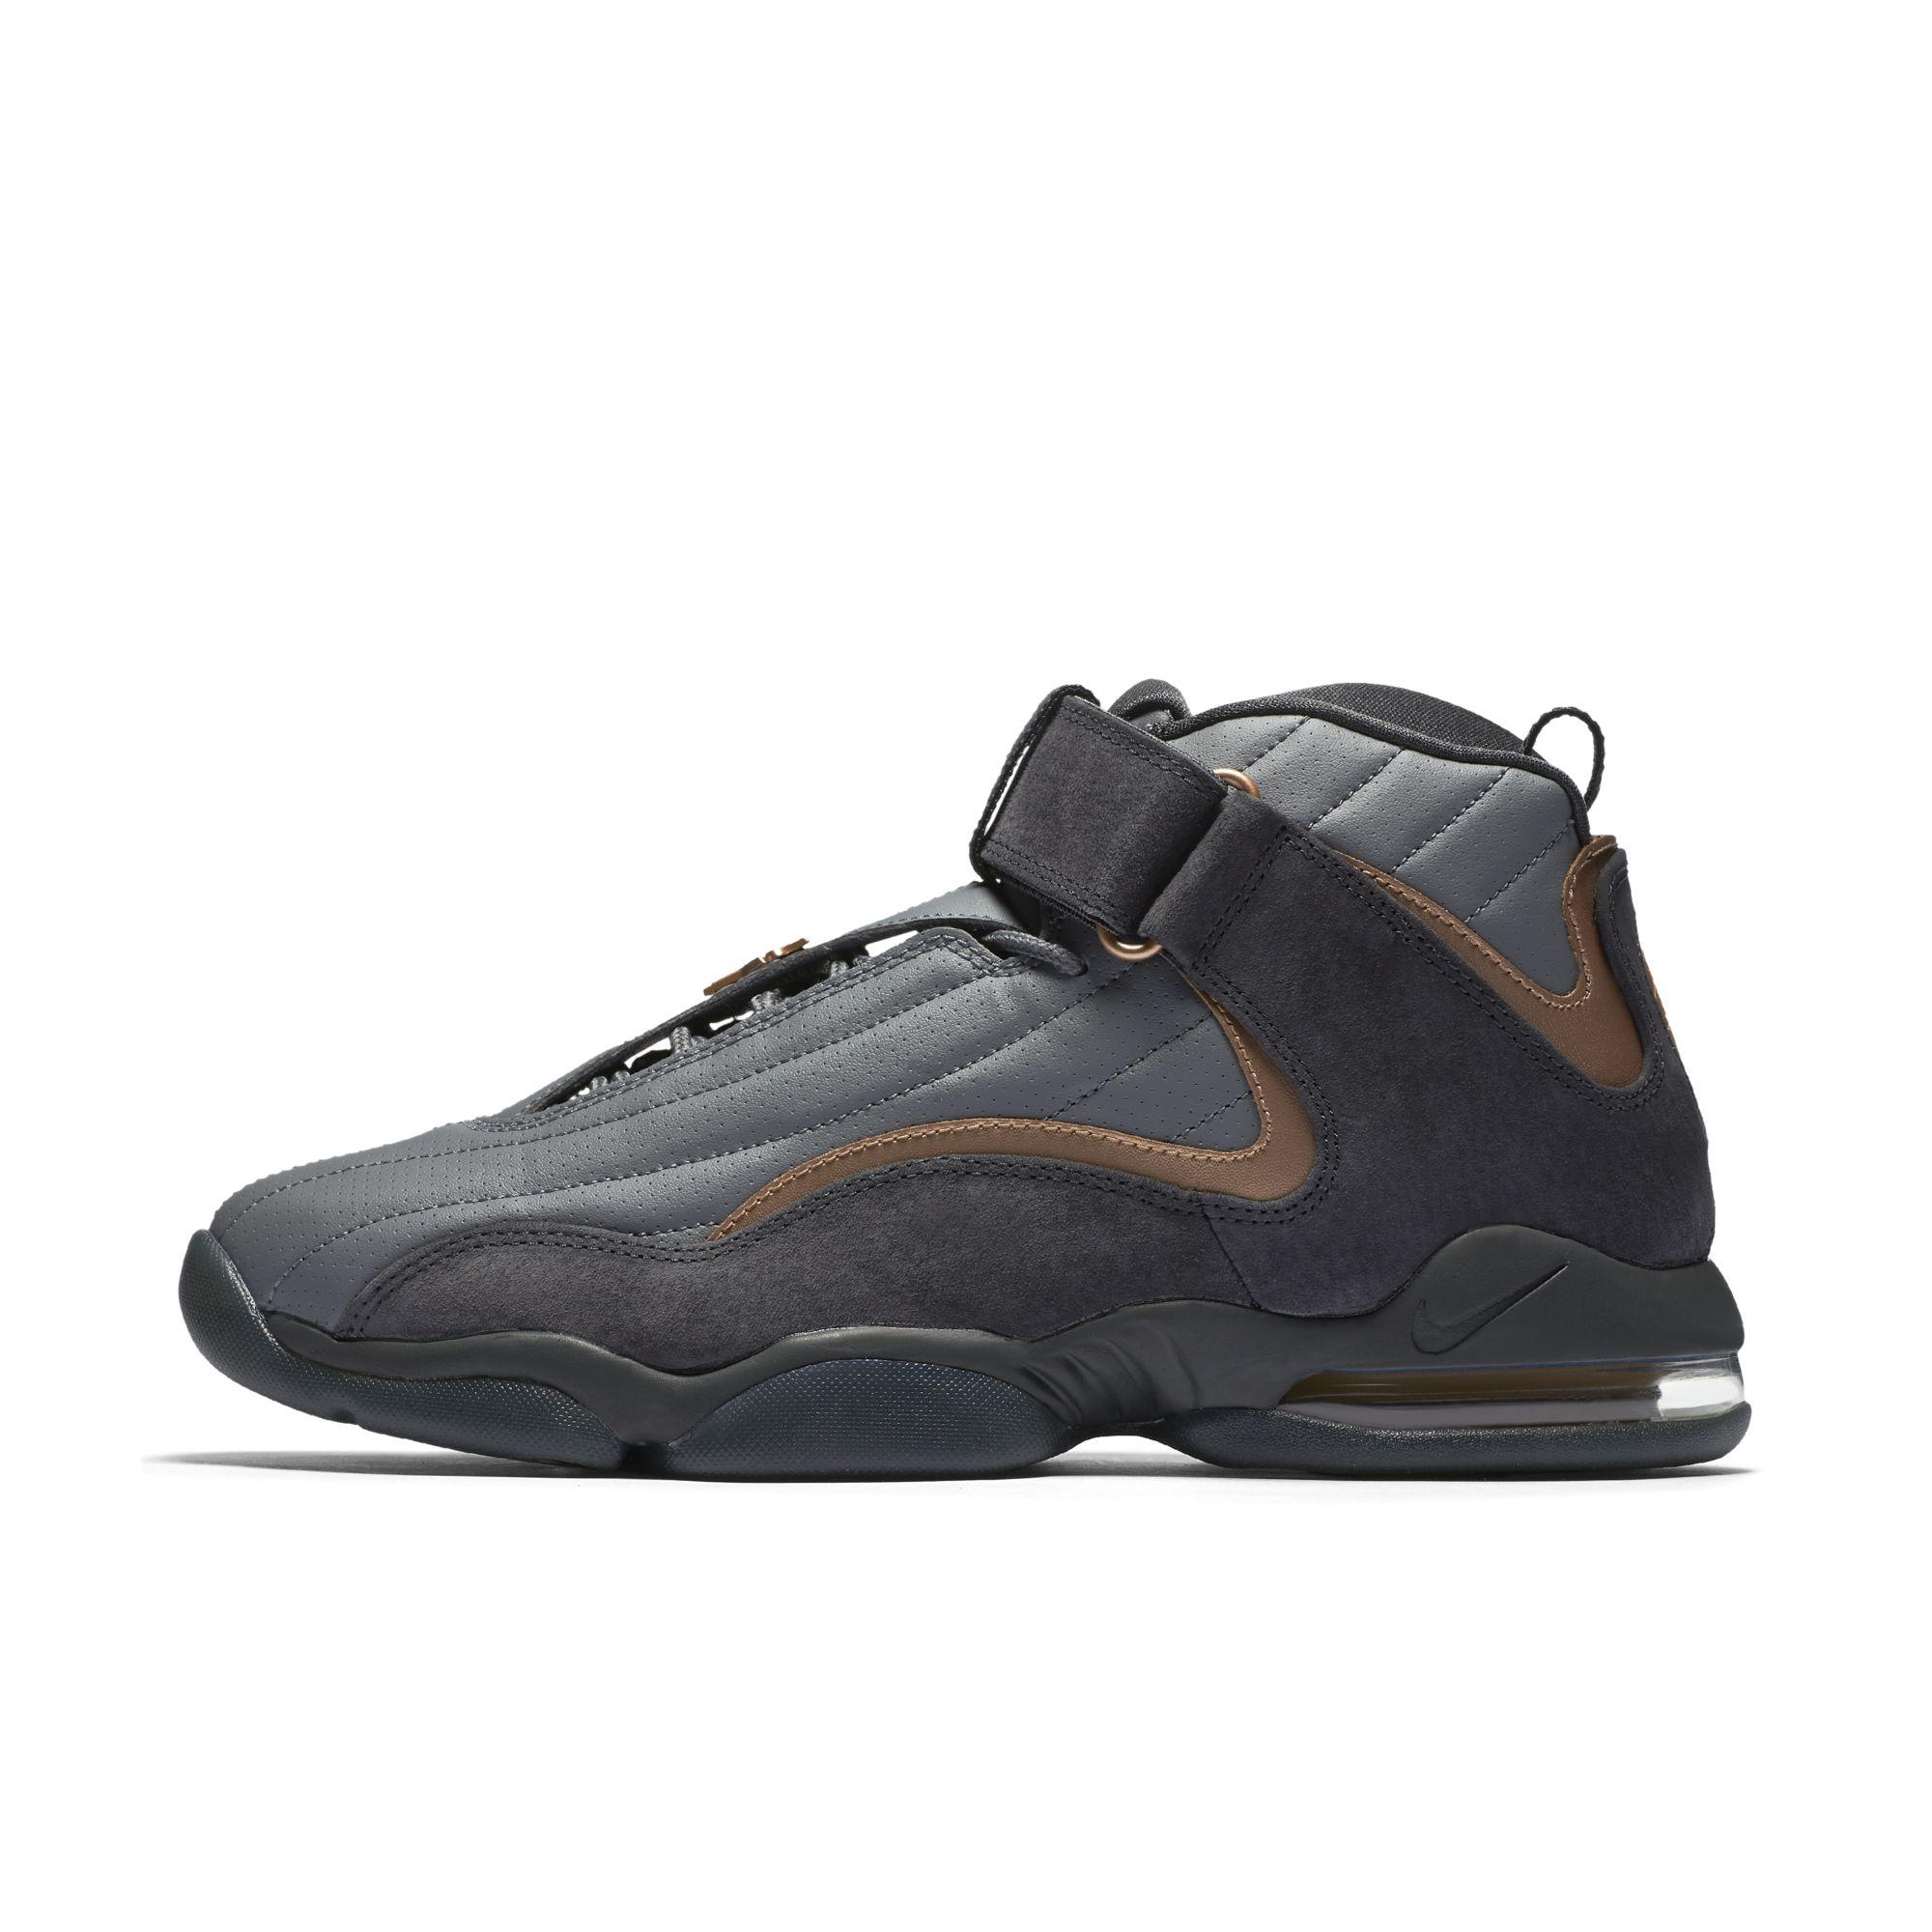 Nike Air Penny 4 Retro 'Copper